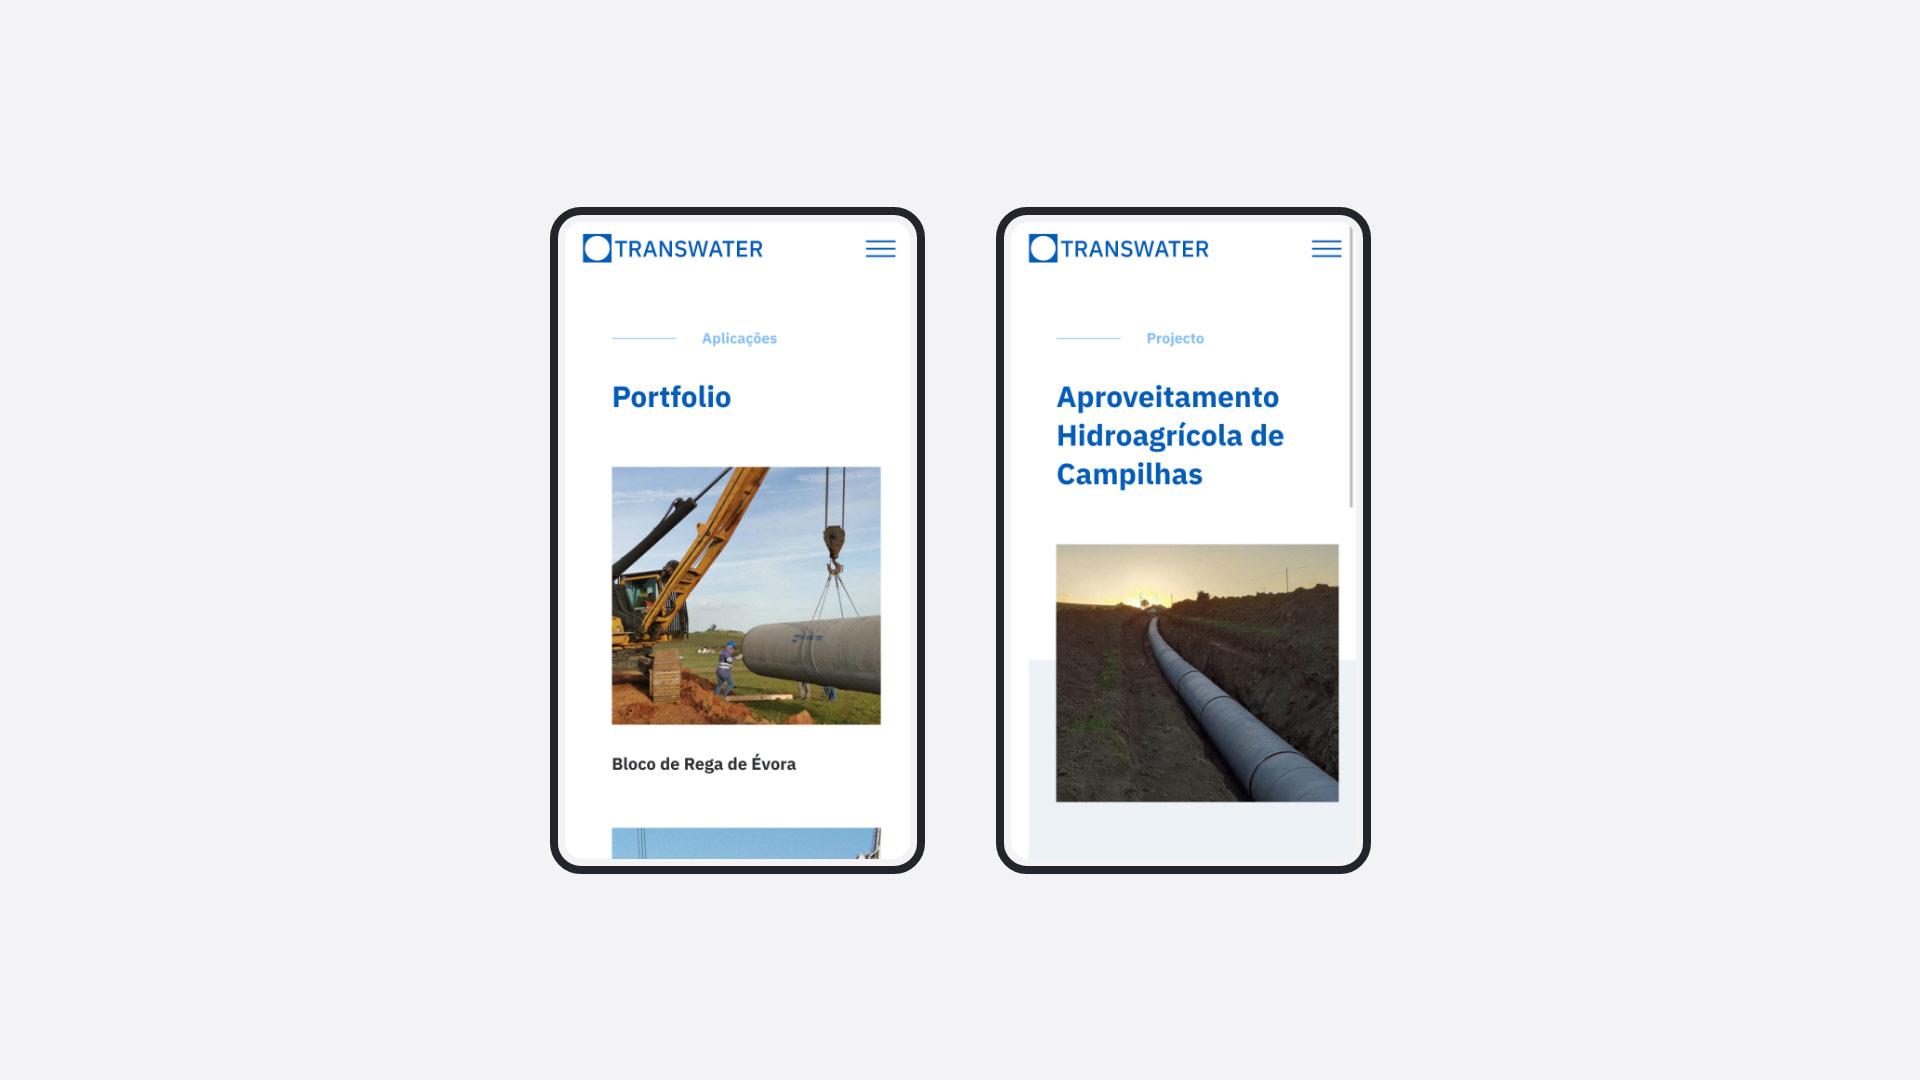 Transwater website by Alaska agency